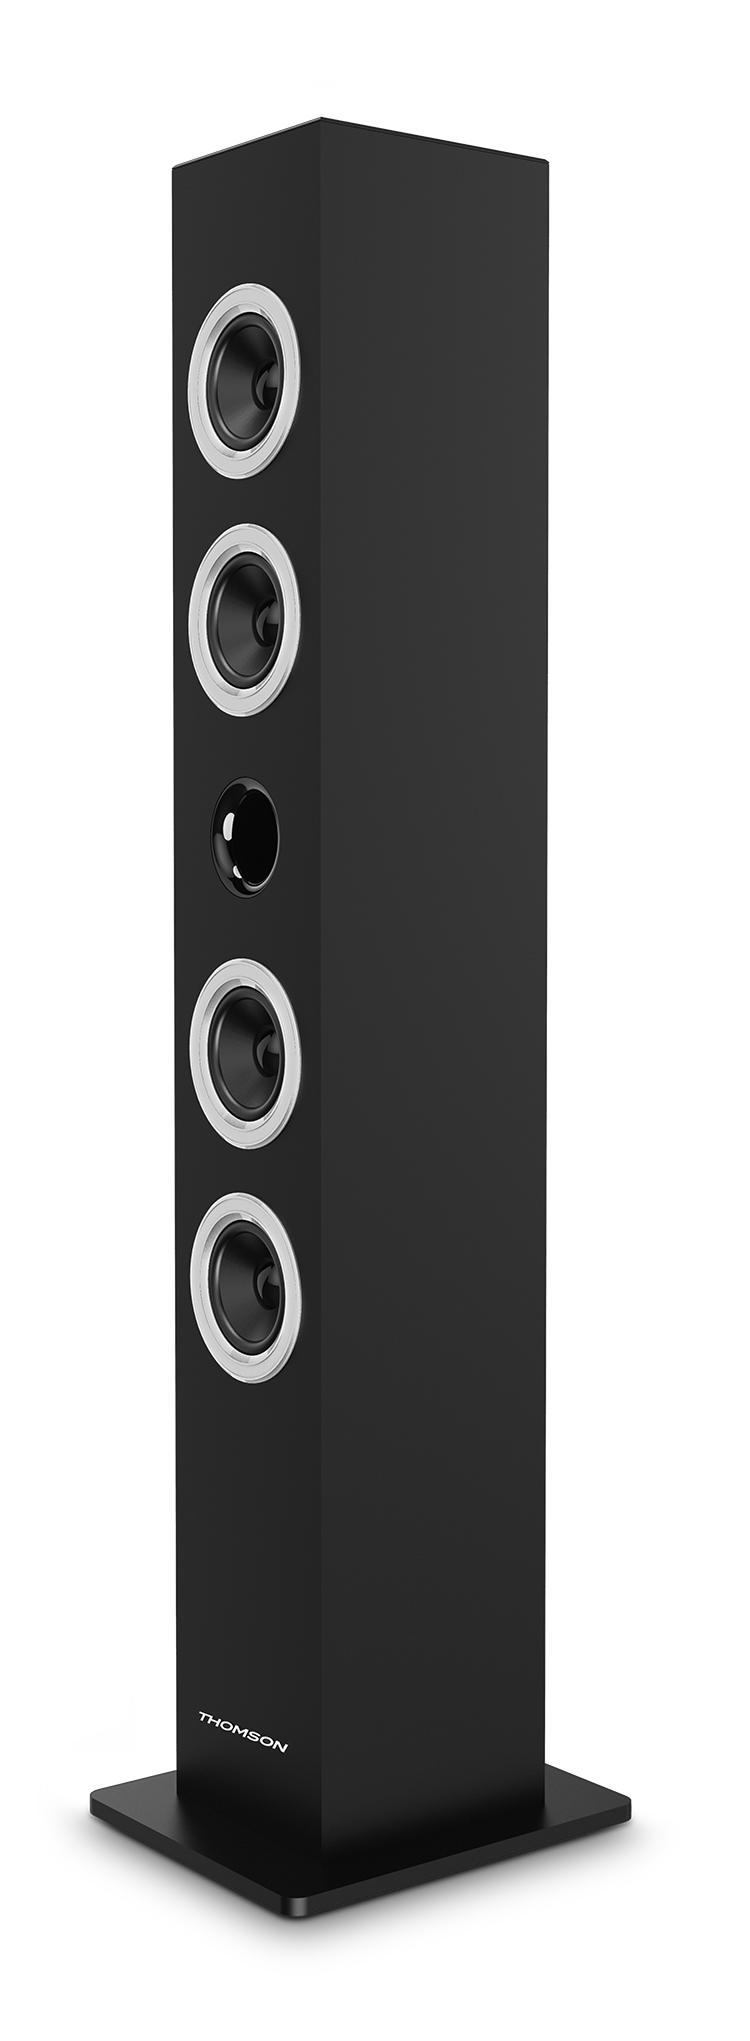 Multimedia tower / CD player (black) - Packshot